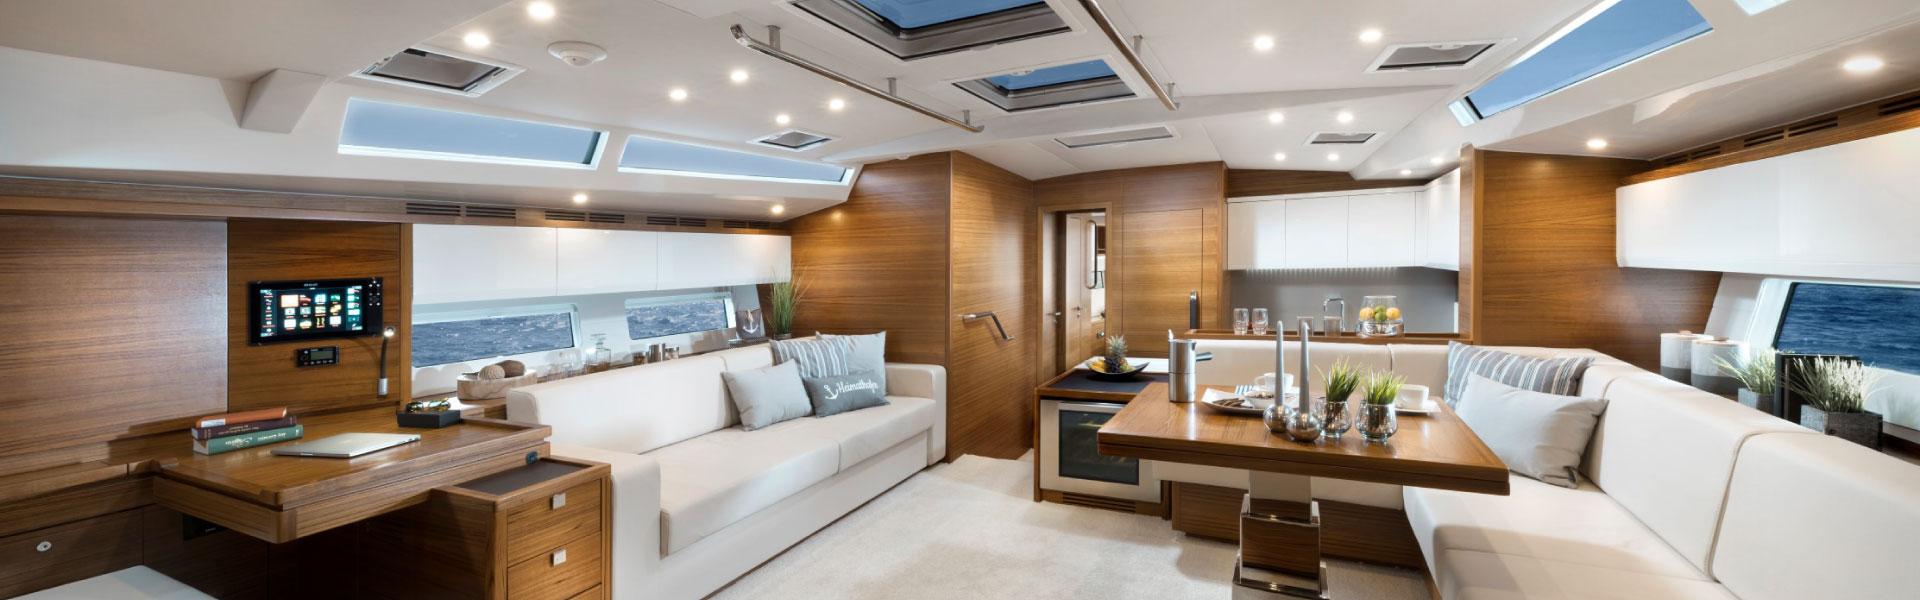 Bavaria Yachts C65 Interieur